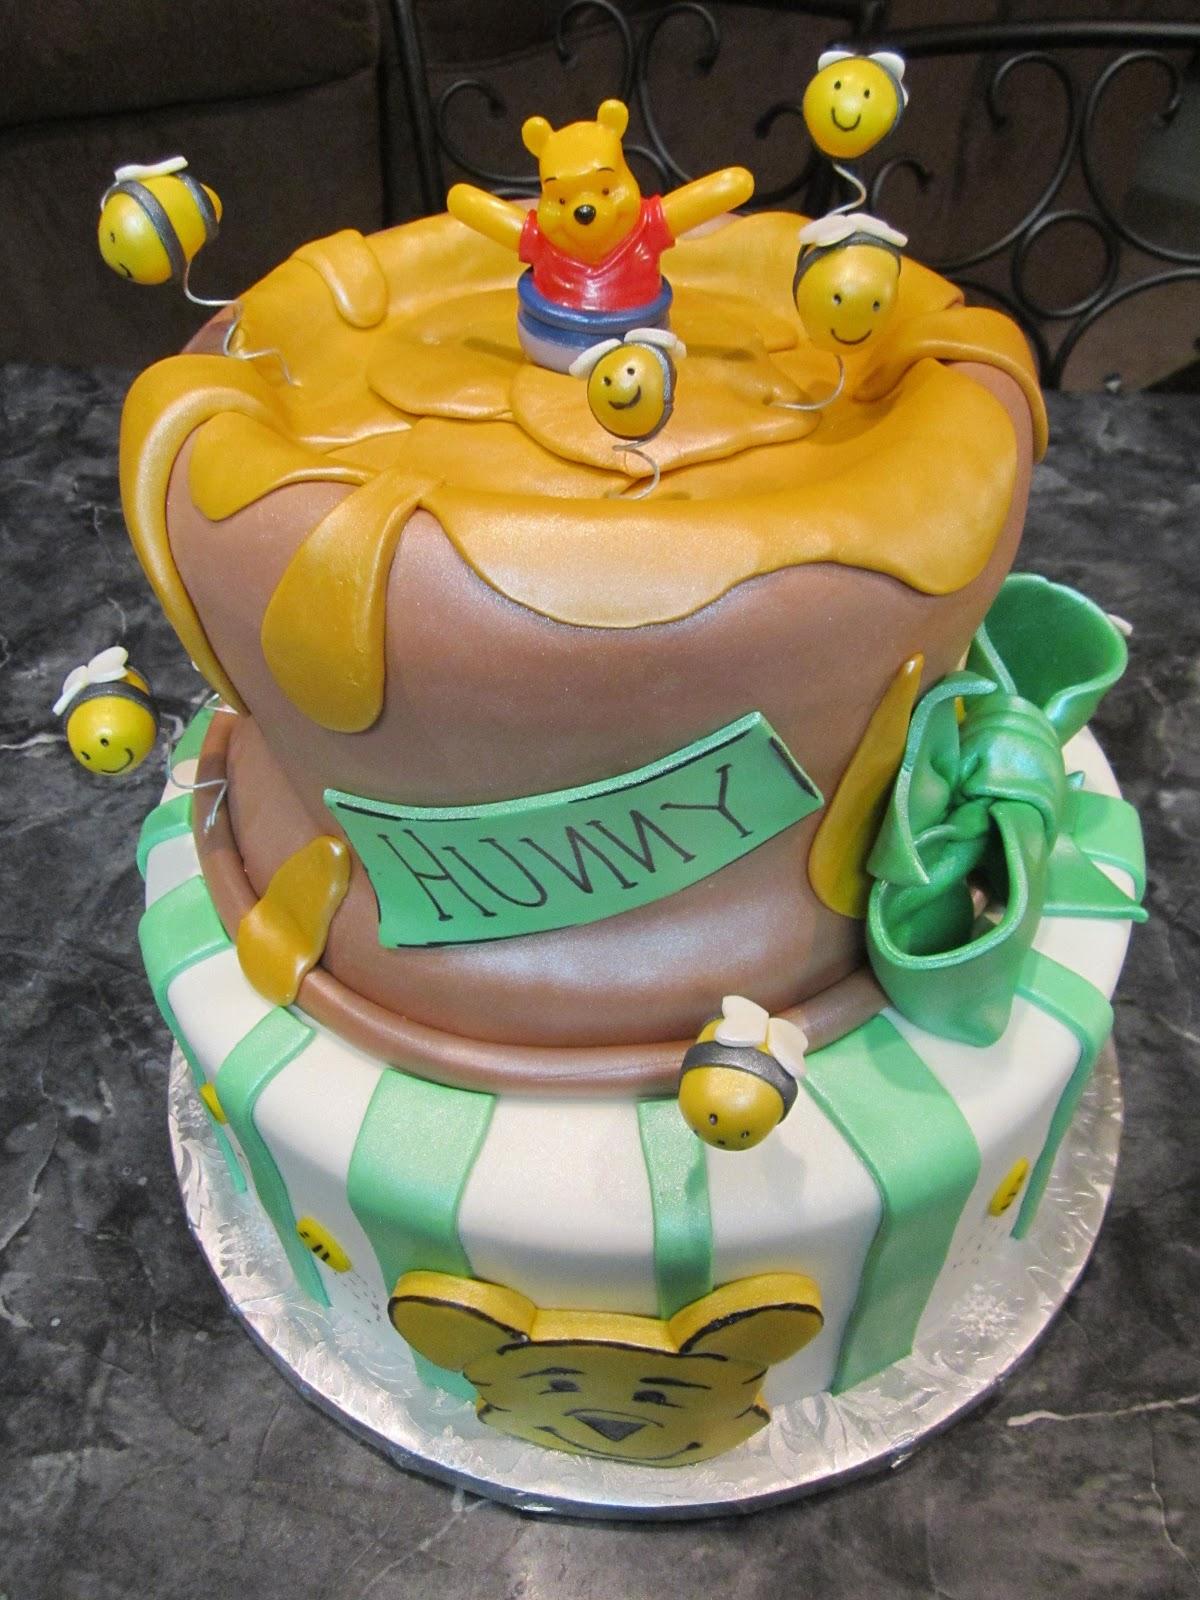 Mymonicakes Winnie The Pooh Honeypot Cake With Bee Hive